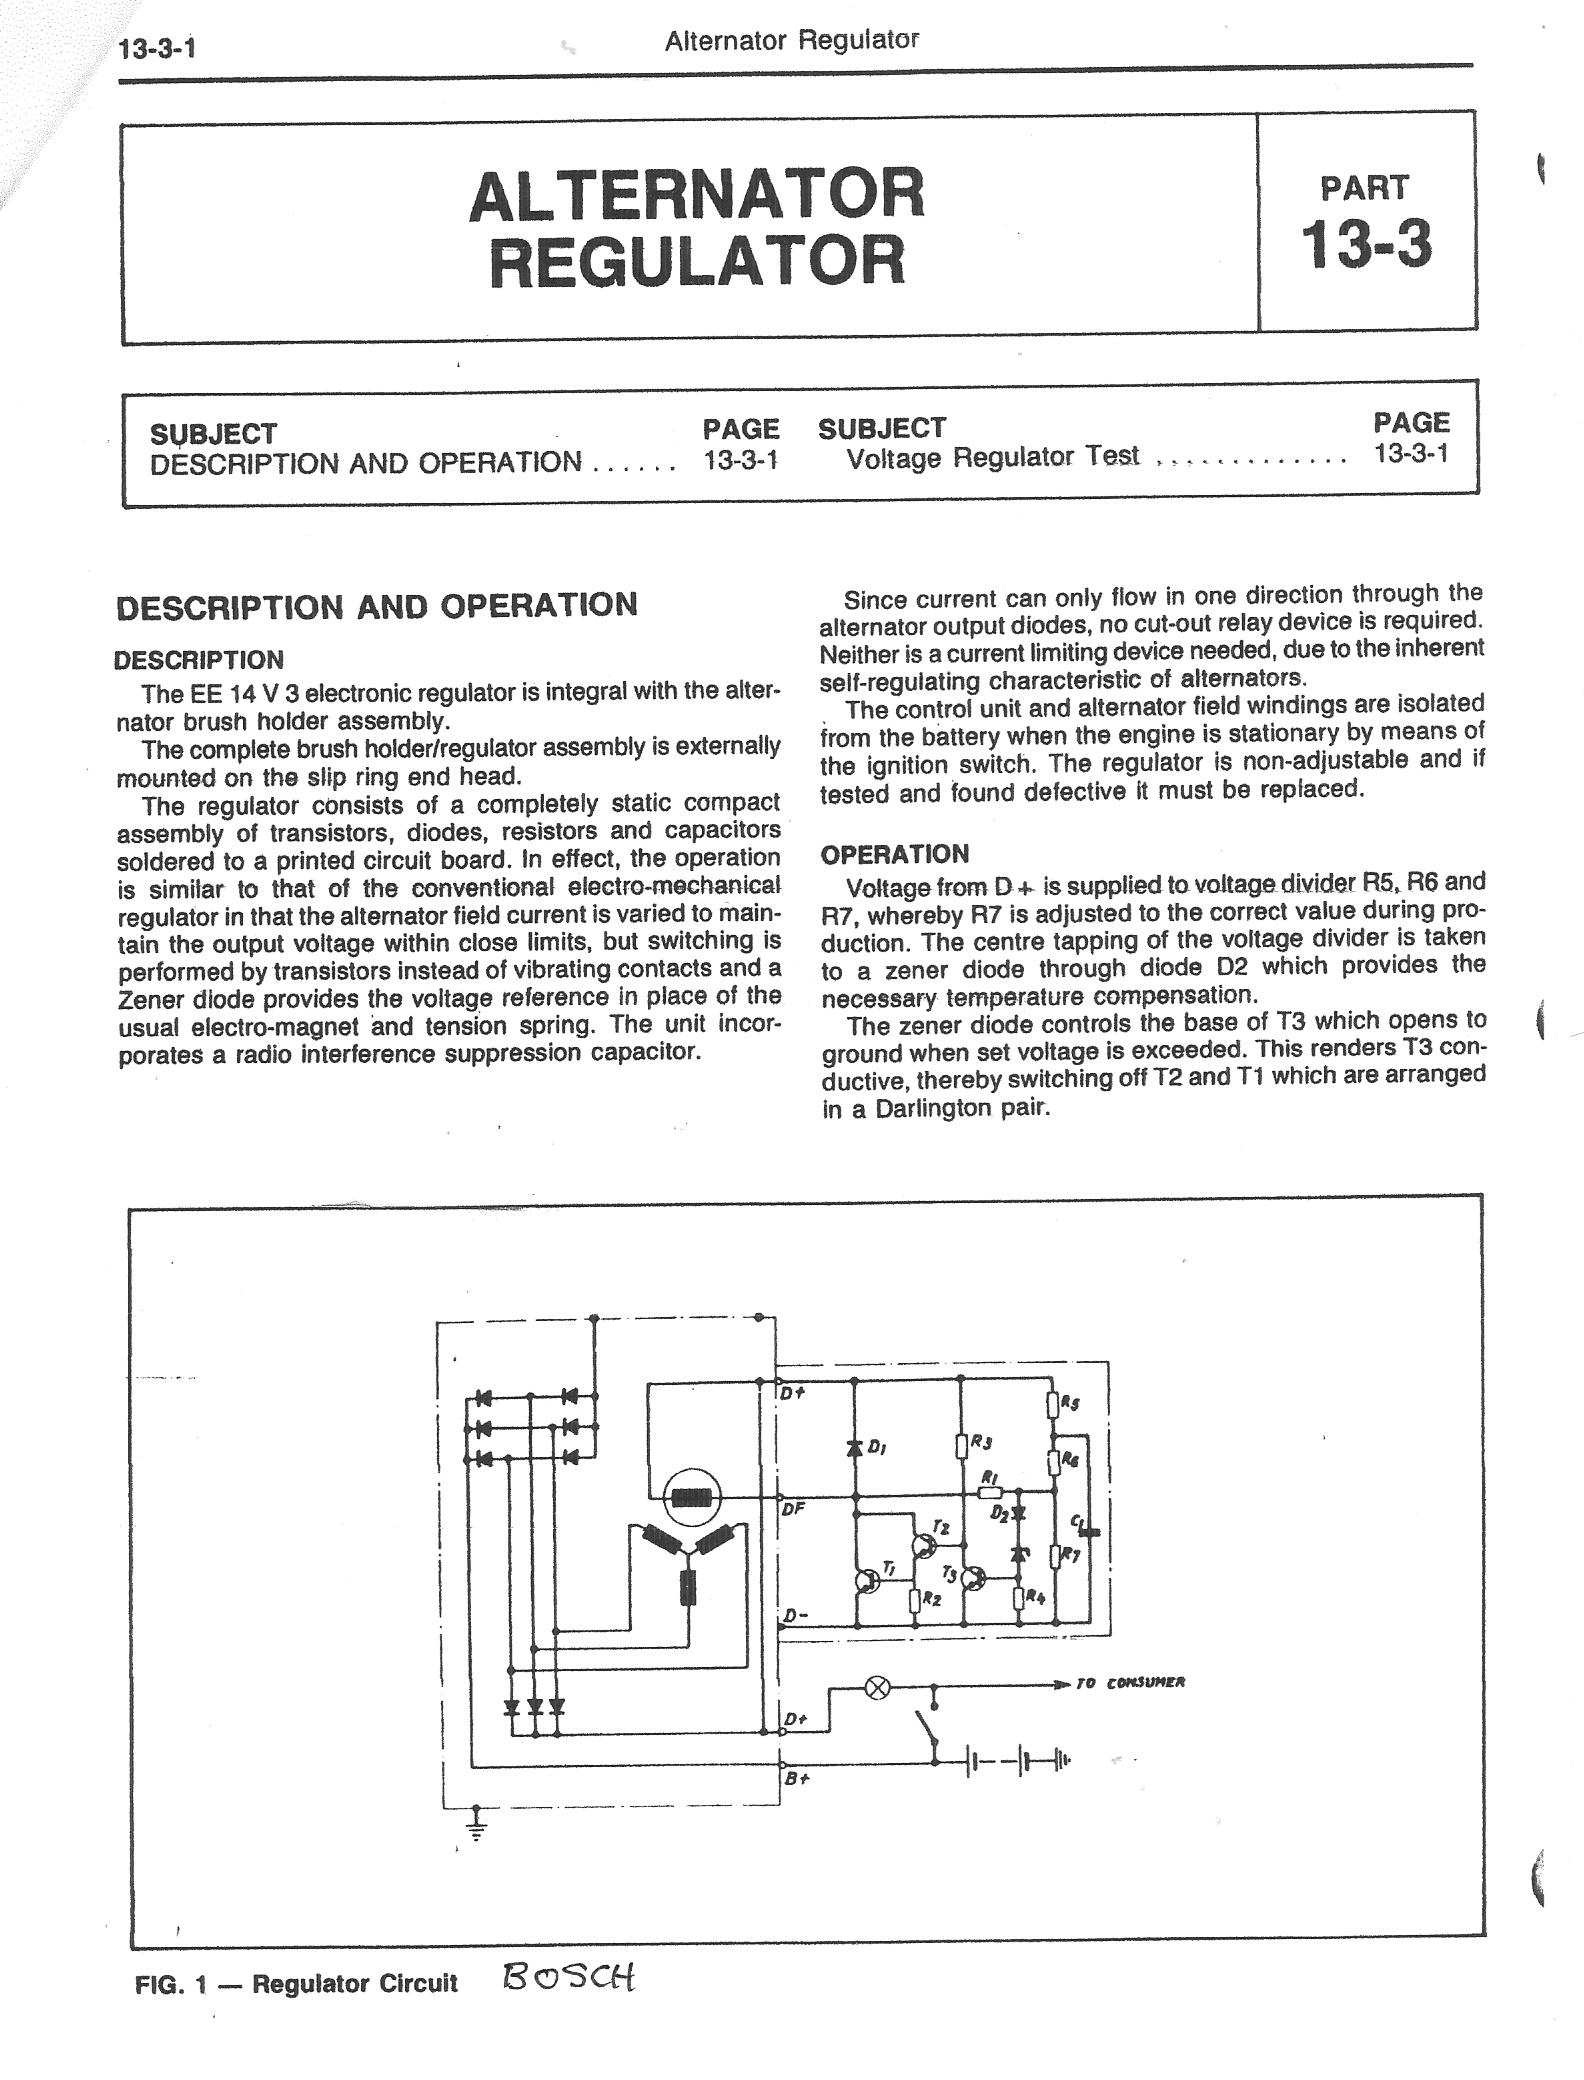 converting an externally regulated to internally regulated Alternator Regulator Wiring Diagram bosch alternator external regulator wiring diagram wiring diagram external regulator alternator wiring diagram alternator regulator wiring diagram